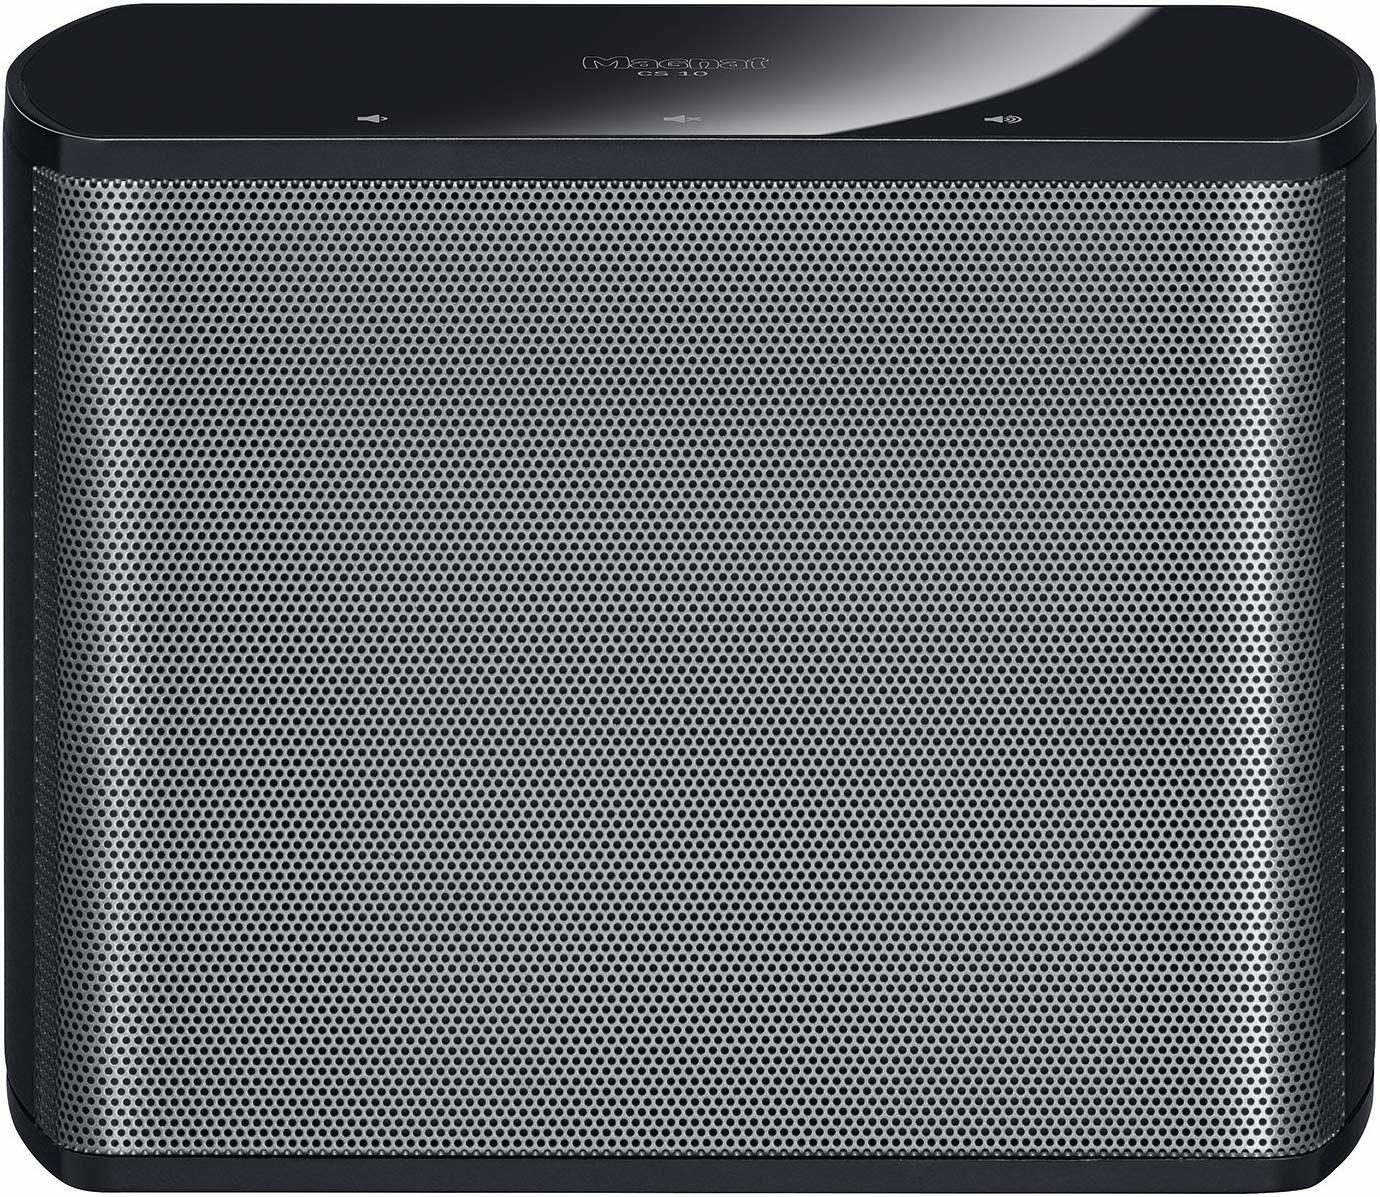 Magnat CS10: WLAN-Lautsprecher (Multiroom, Akku, AUX/LAN, 2,5cm Hochtöner, 12cm Breitband)